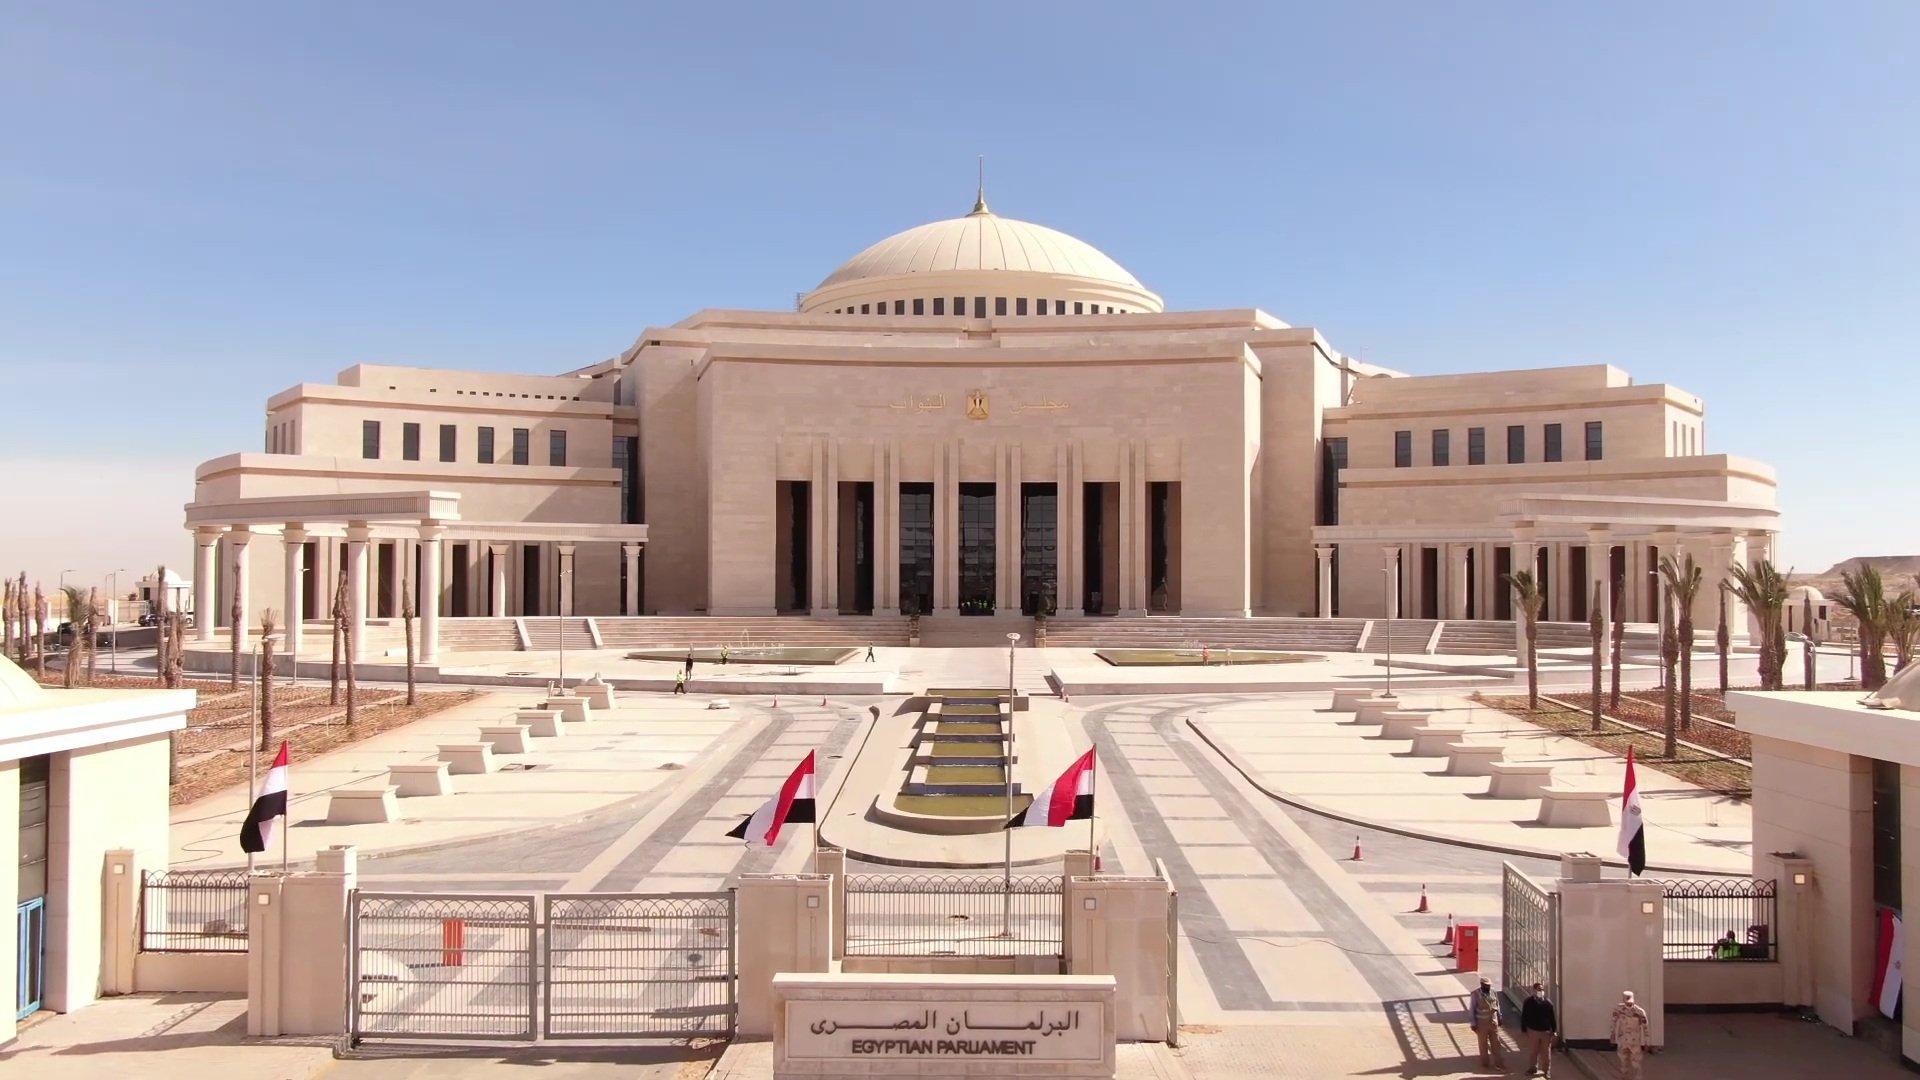 2021-08-29 Egypt Parliament New Administrative Capital 2021 01